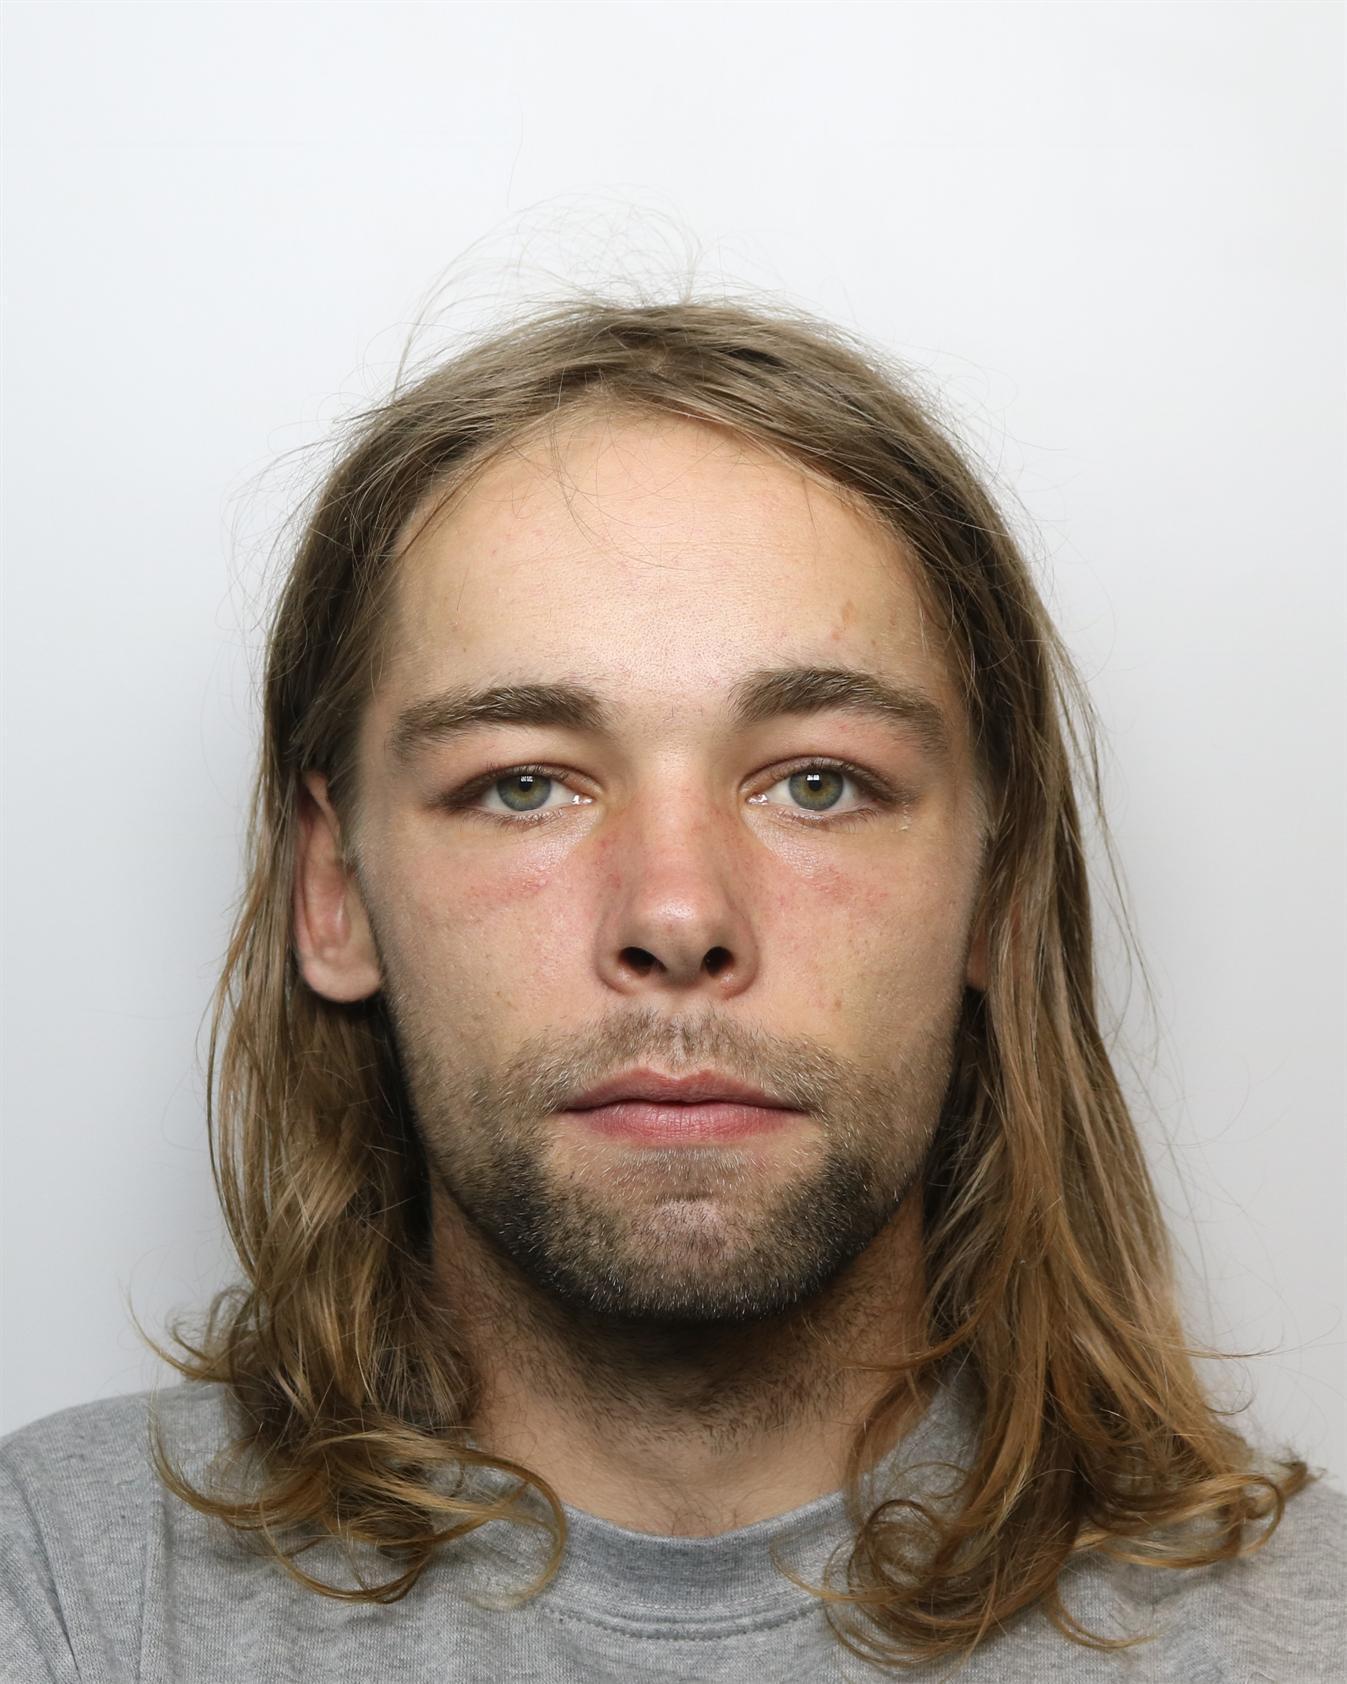 Ram-raider grabbed vodka before crashing stolen car into bollard at 90mph